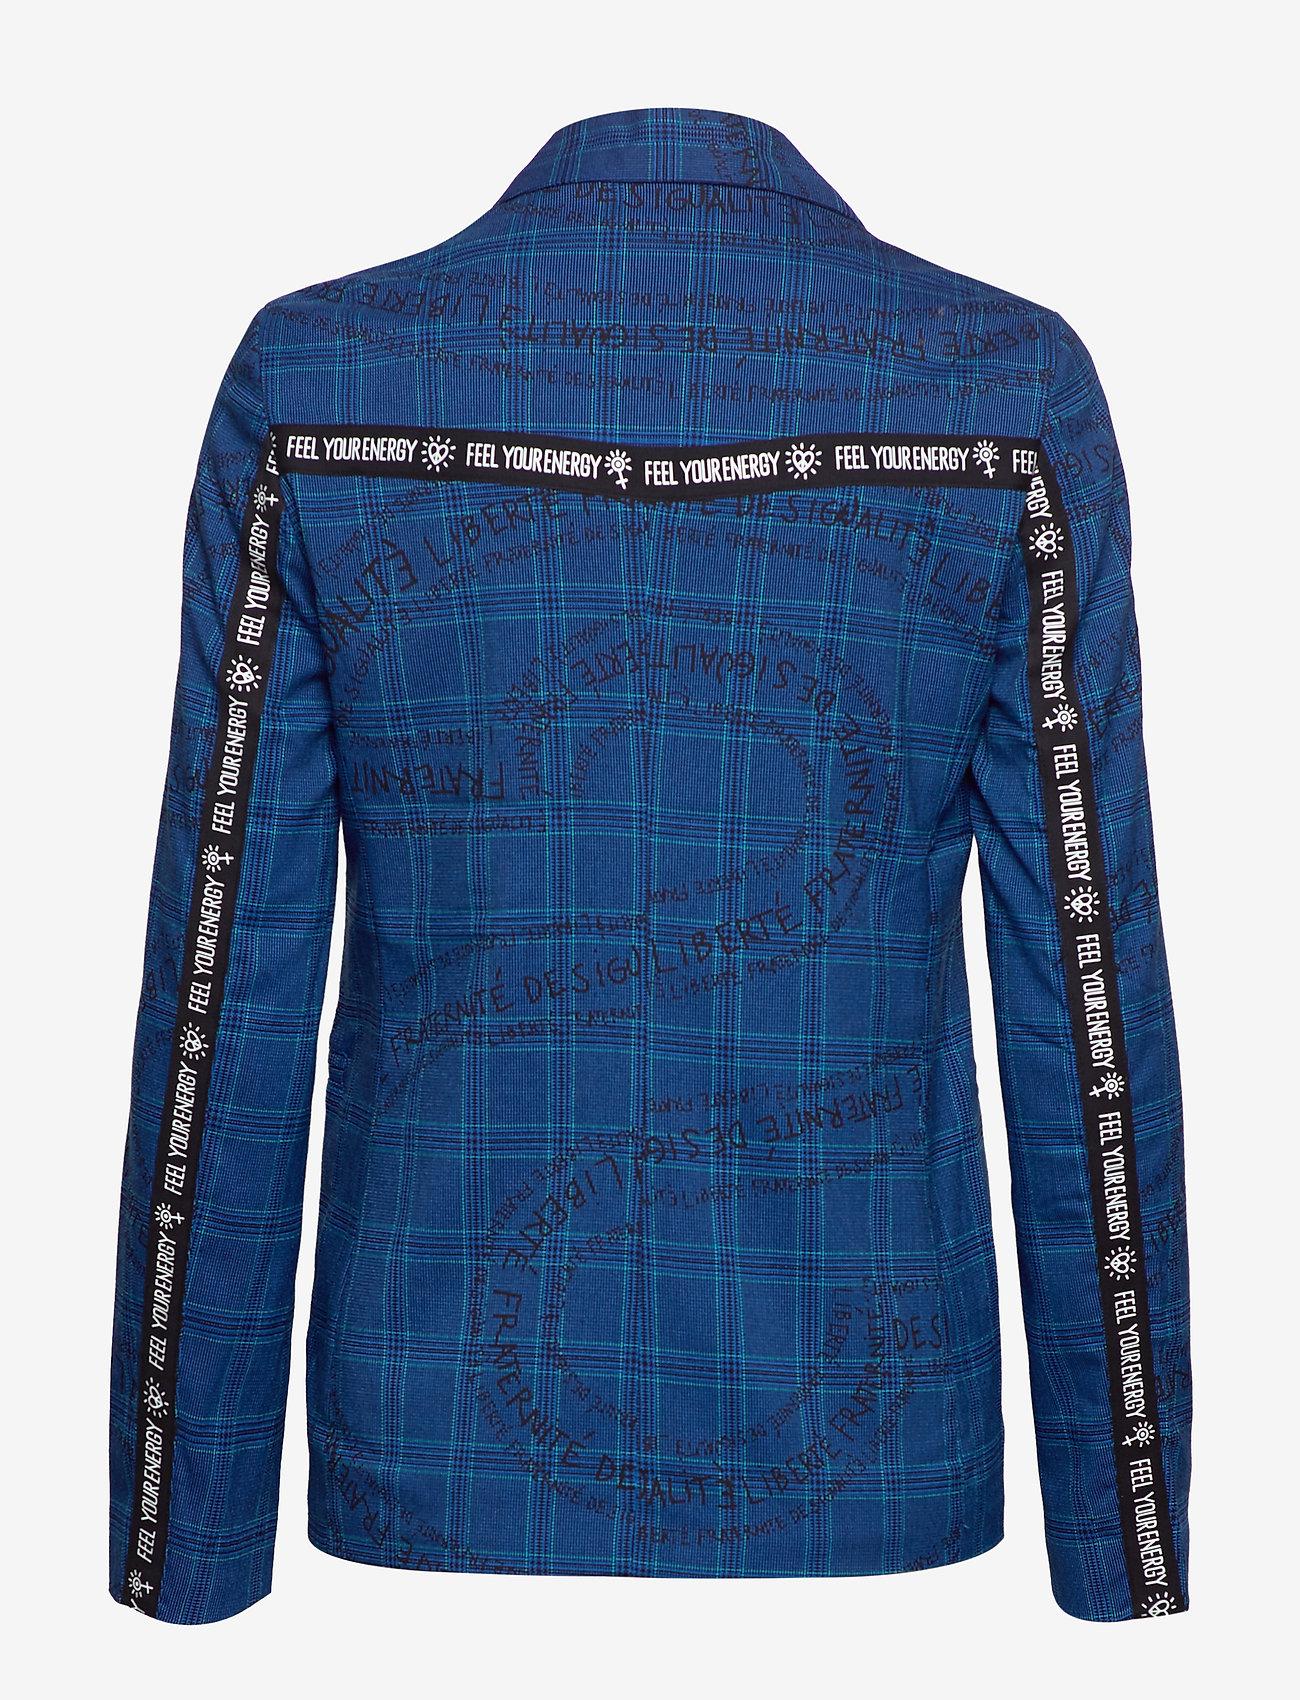 Desigual Chaq Turin - Vestes Tailleur Royal Blue